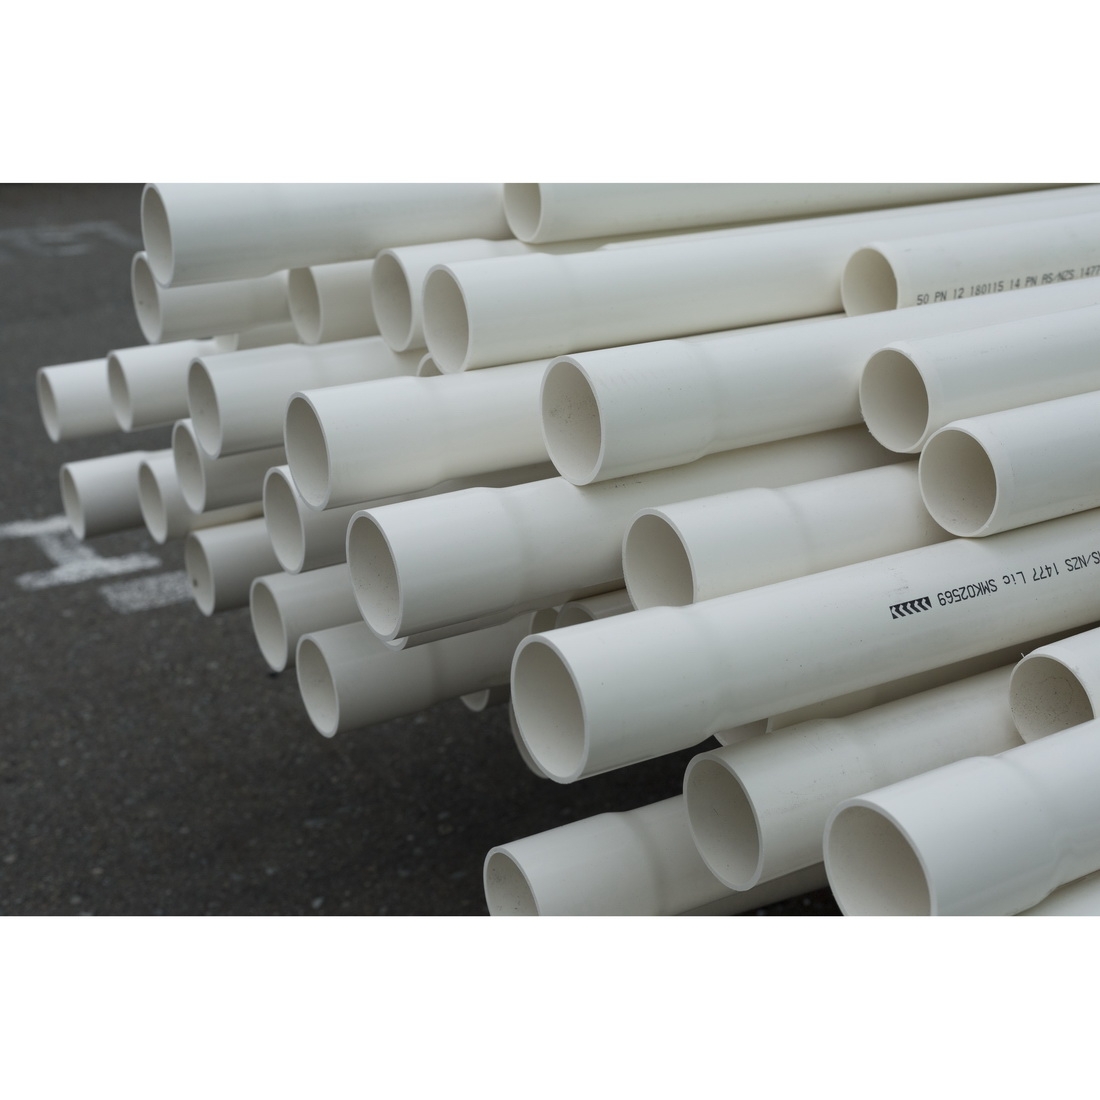 Iplex Novakey 1 Series Pressure Pipe 15 mm x 6 m PN15 Socketed One End uPVC White 800.15PN15.6 SOE